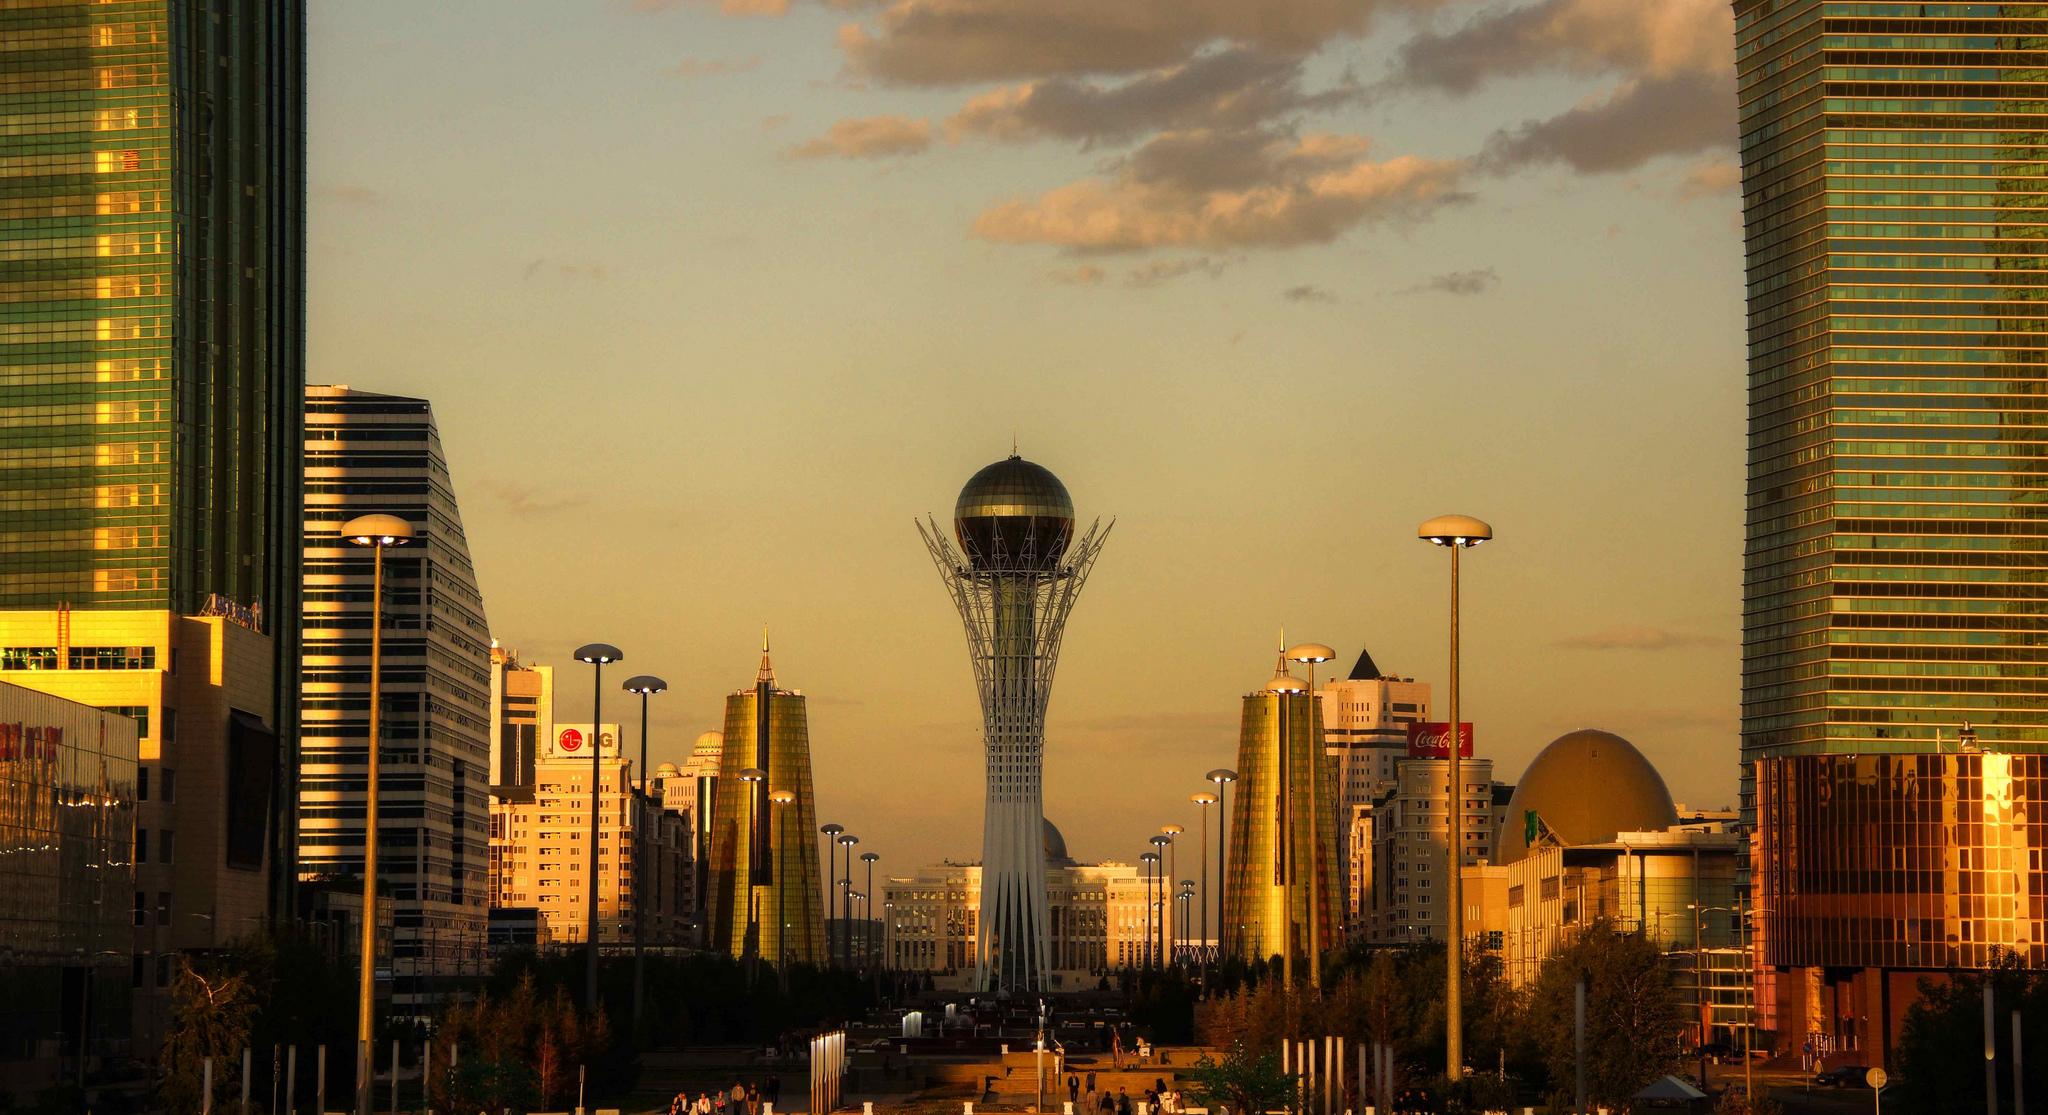 Астана, Казахстан. Фото: mariusz kluzniak / Flickr.com